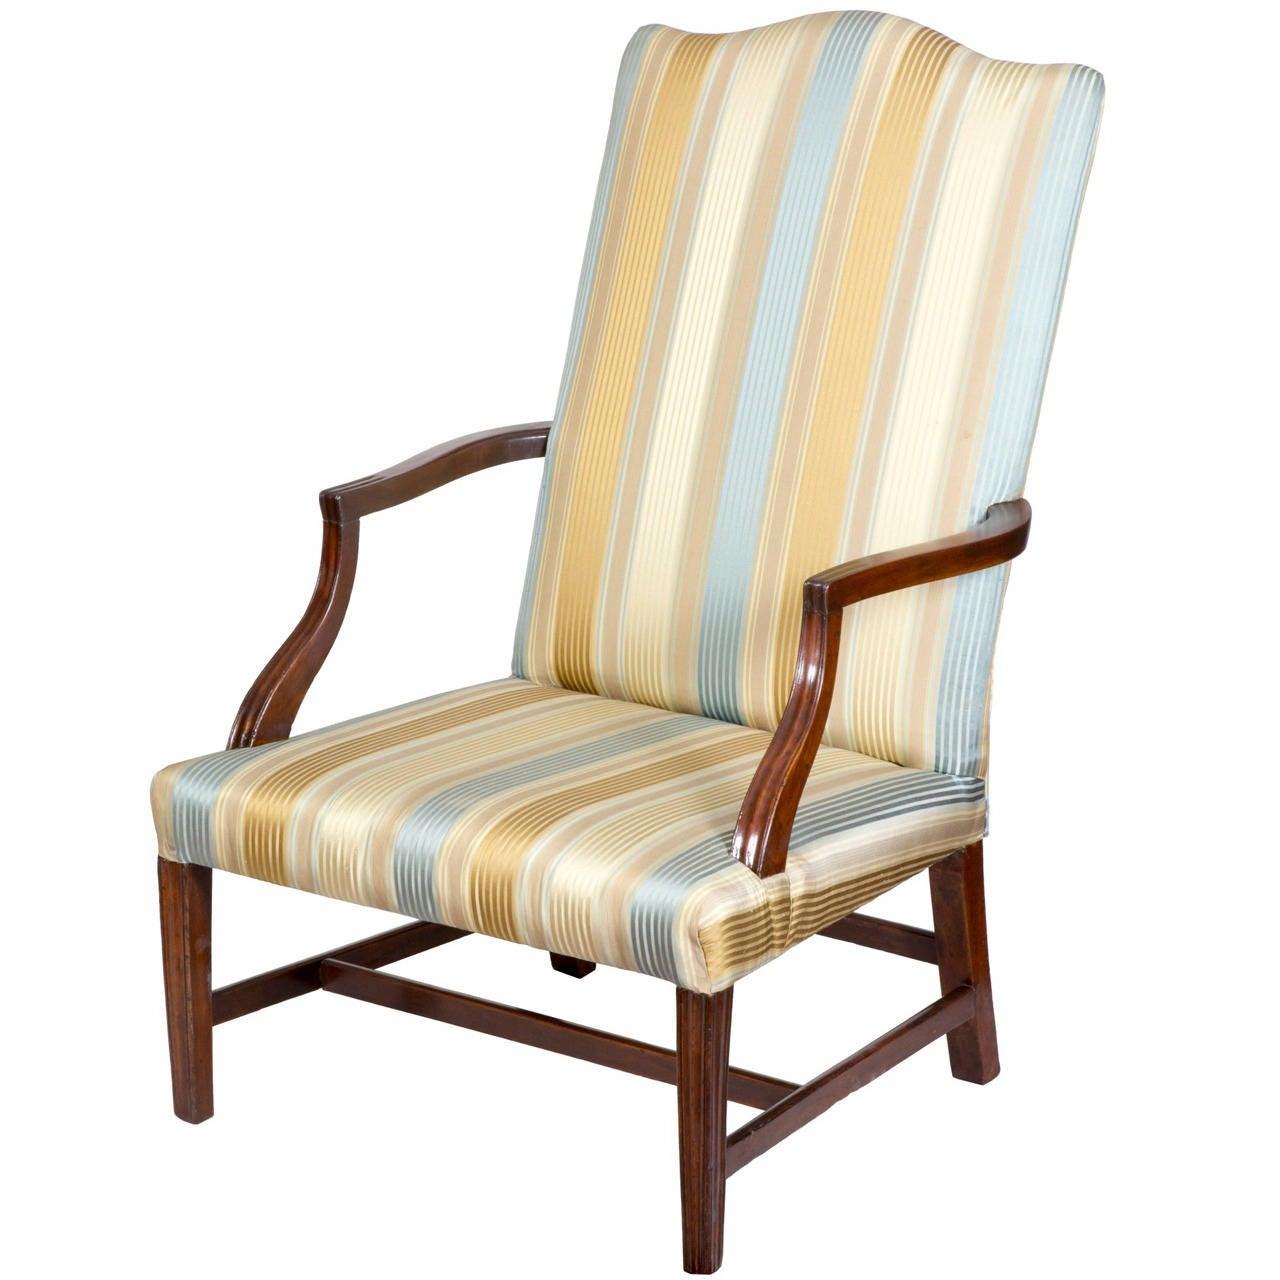 Wonderful Mahogany Federal Lolling Chair, Boston Or North Shore, Circa 1800 1810 1